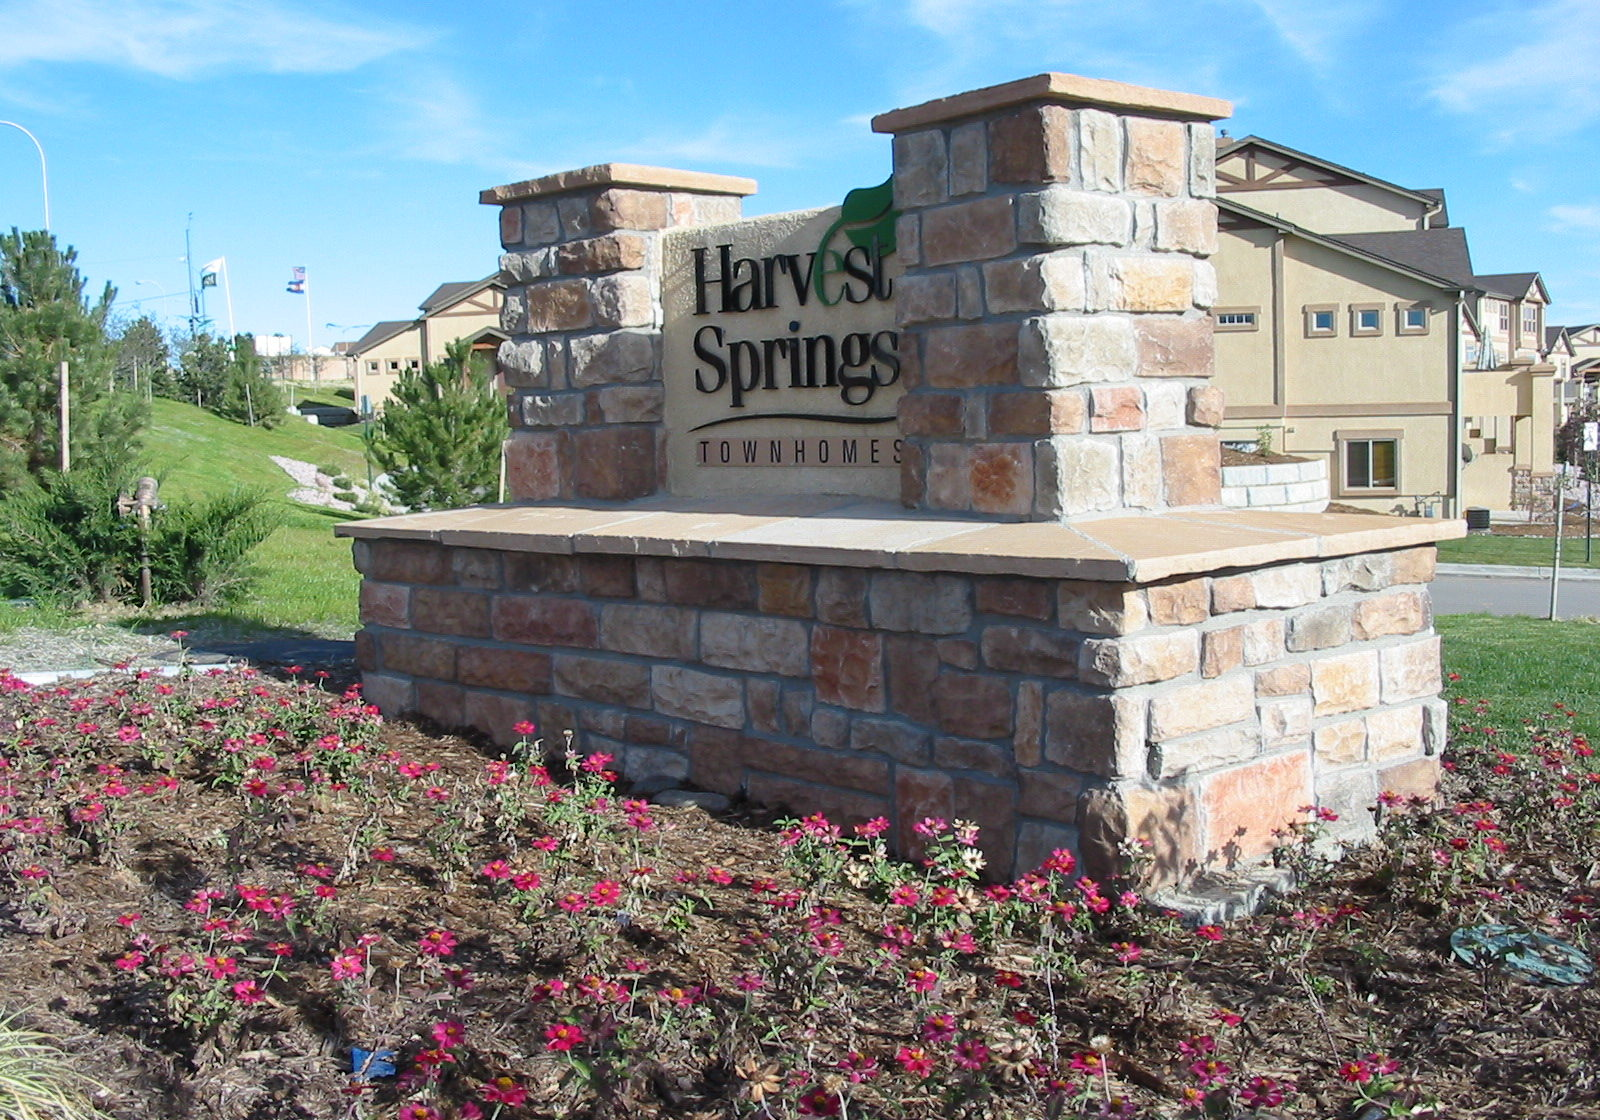 Harvest-Springs_Front-Sign-1